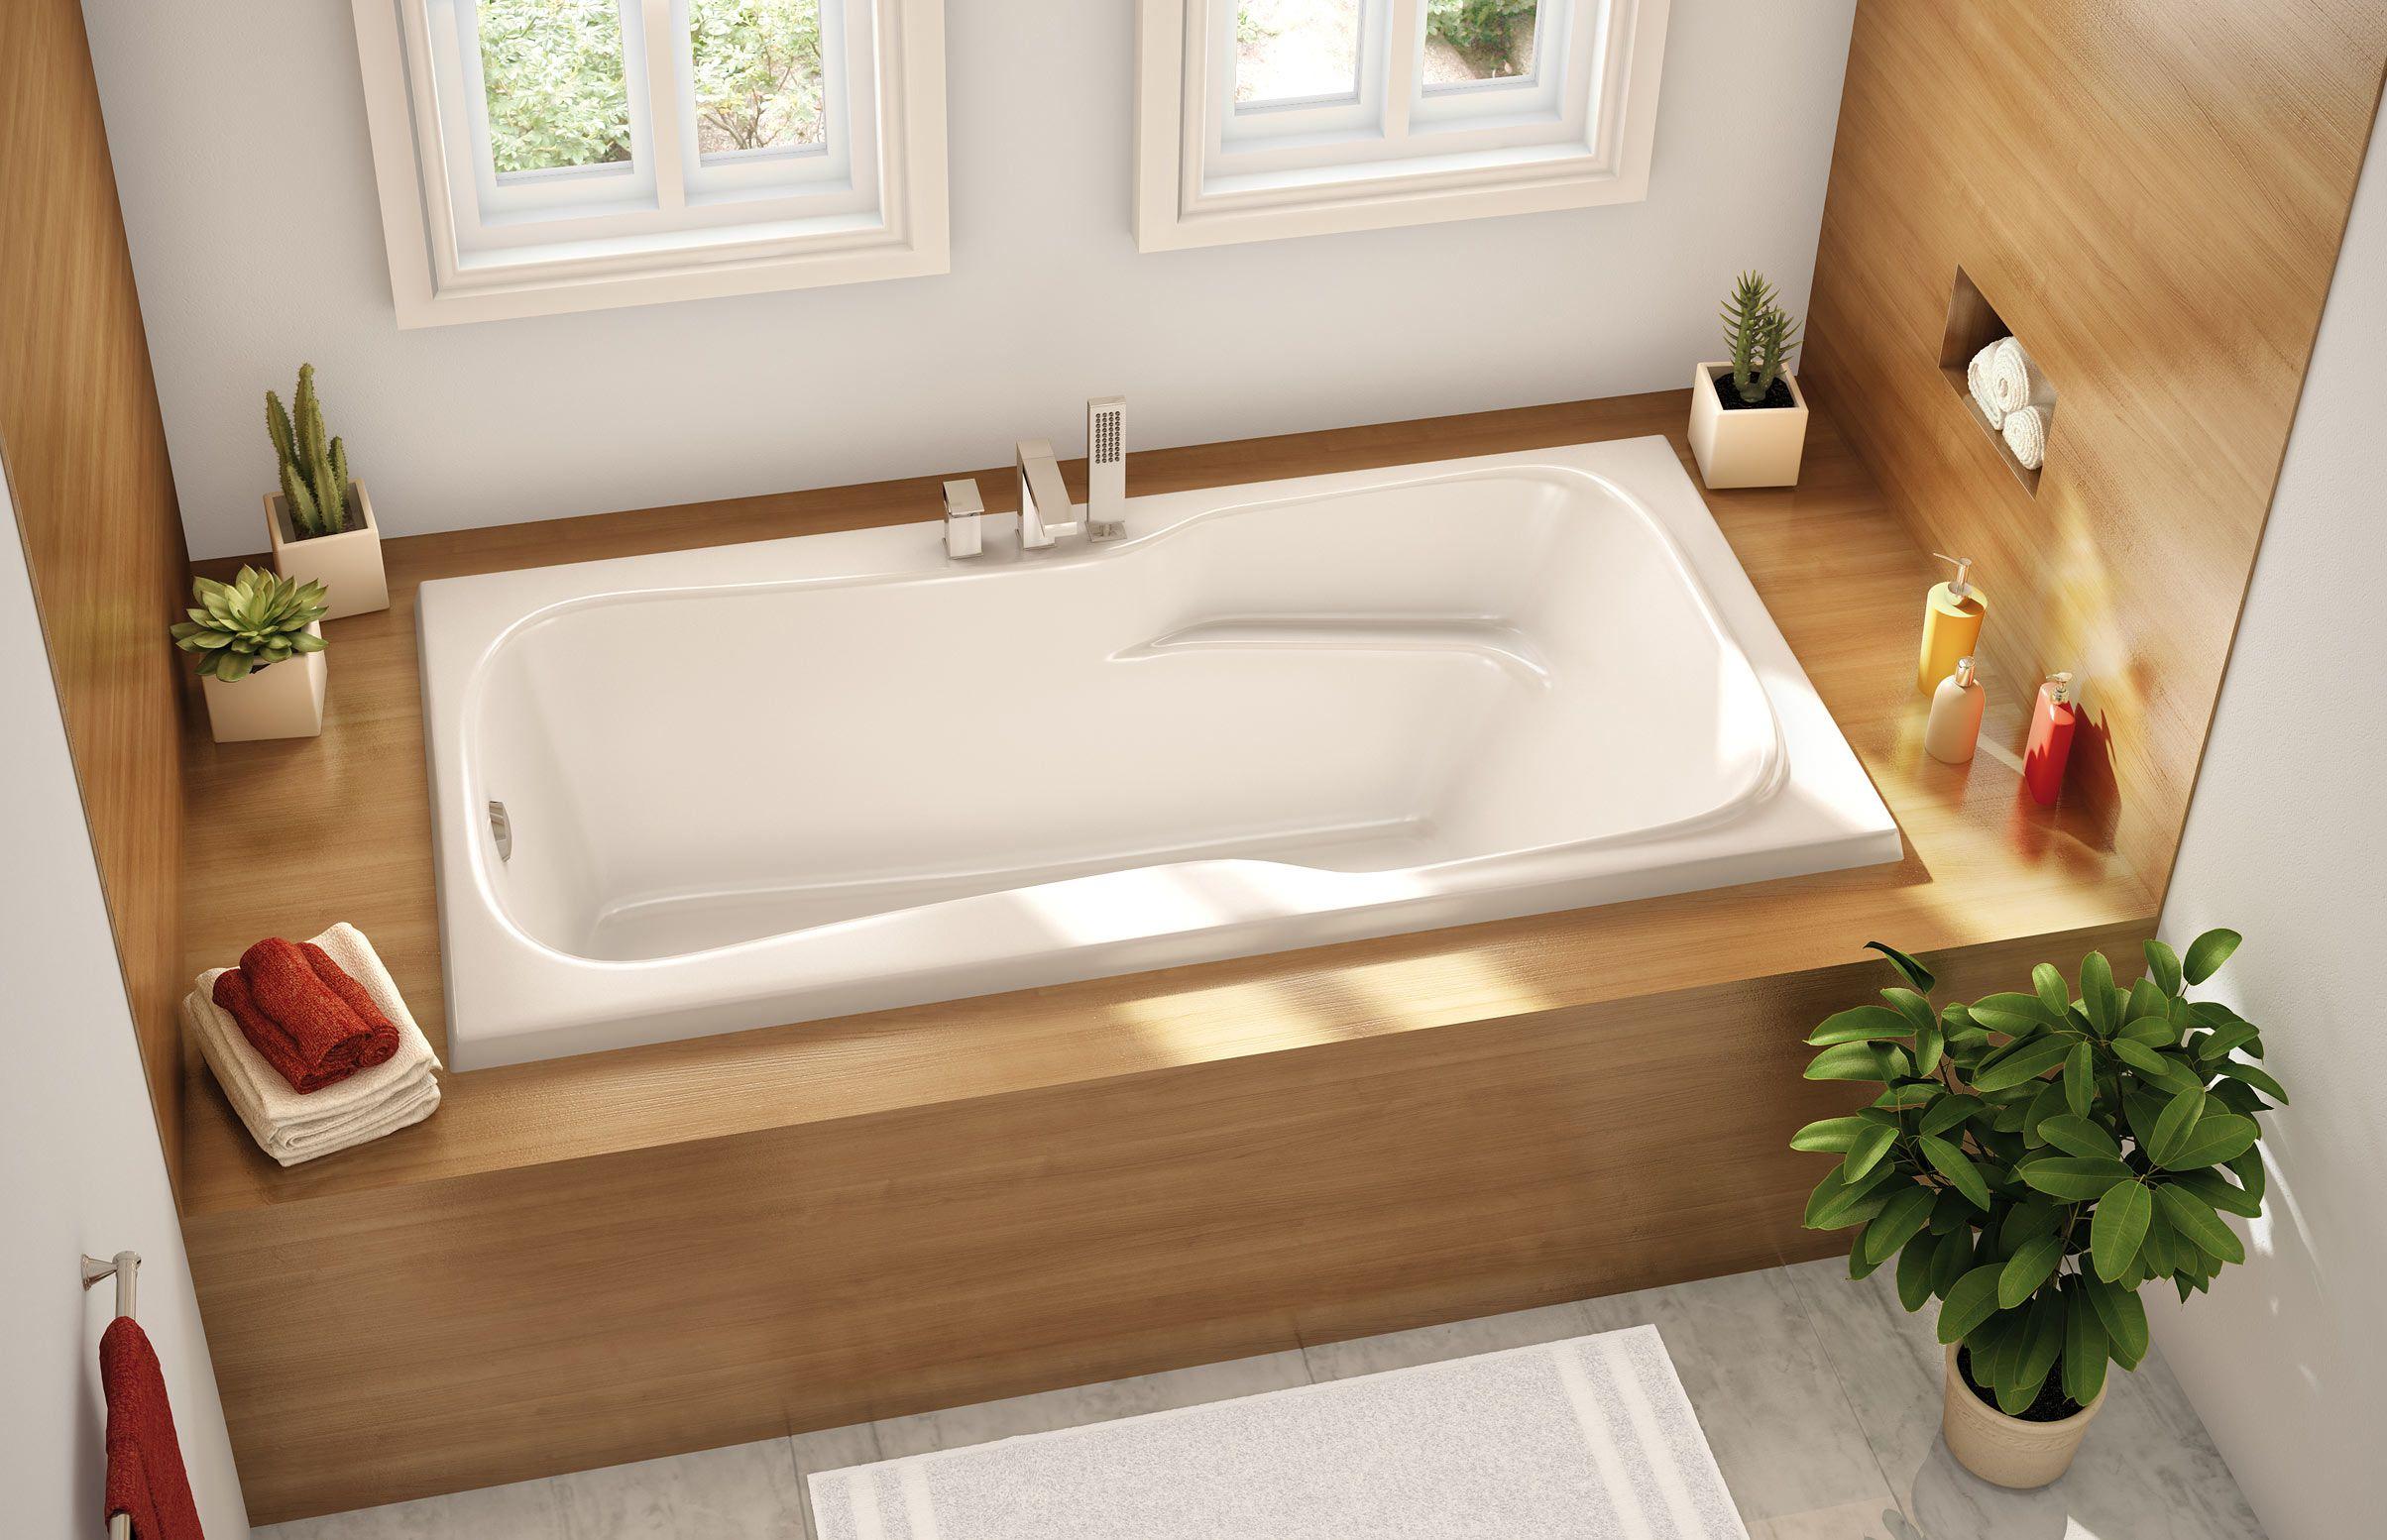 Hidrolife Tubs And Baths Piscinasiniciohidrolife Brasilia Df Spas Hot Hot Tubs Pergolas Deck Modern Banyo Tasarimi Banyo Yeniden Modelleme Kucuk Banyo